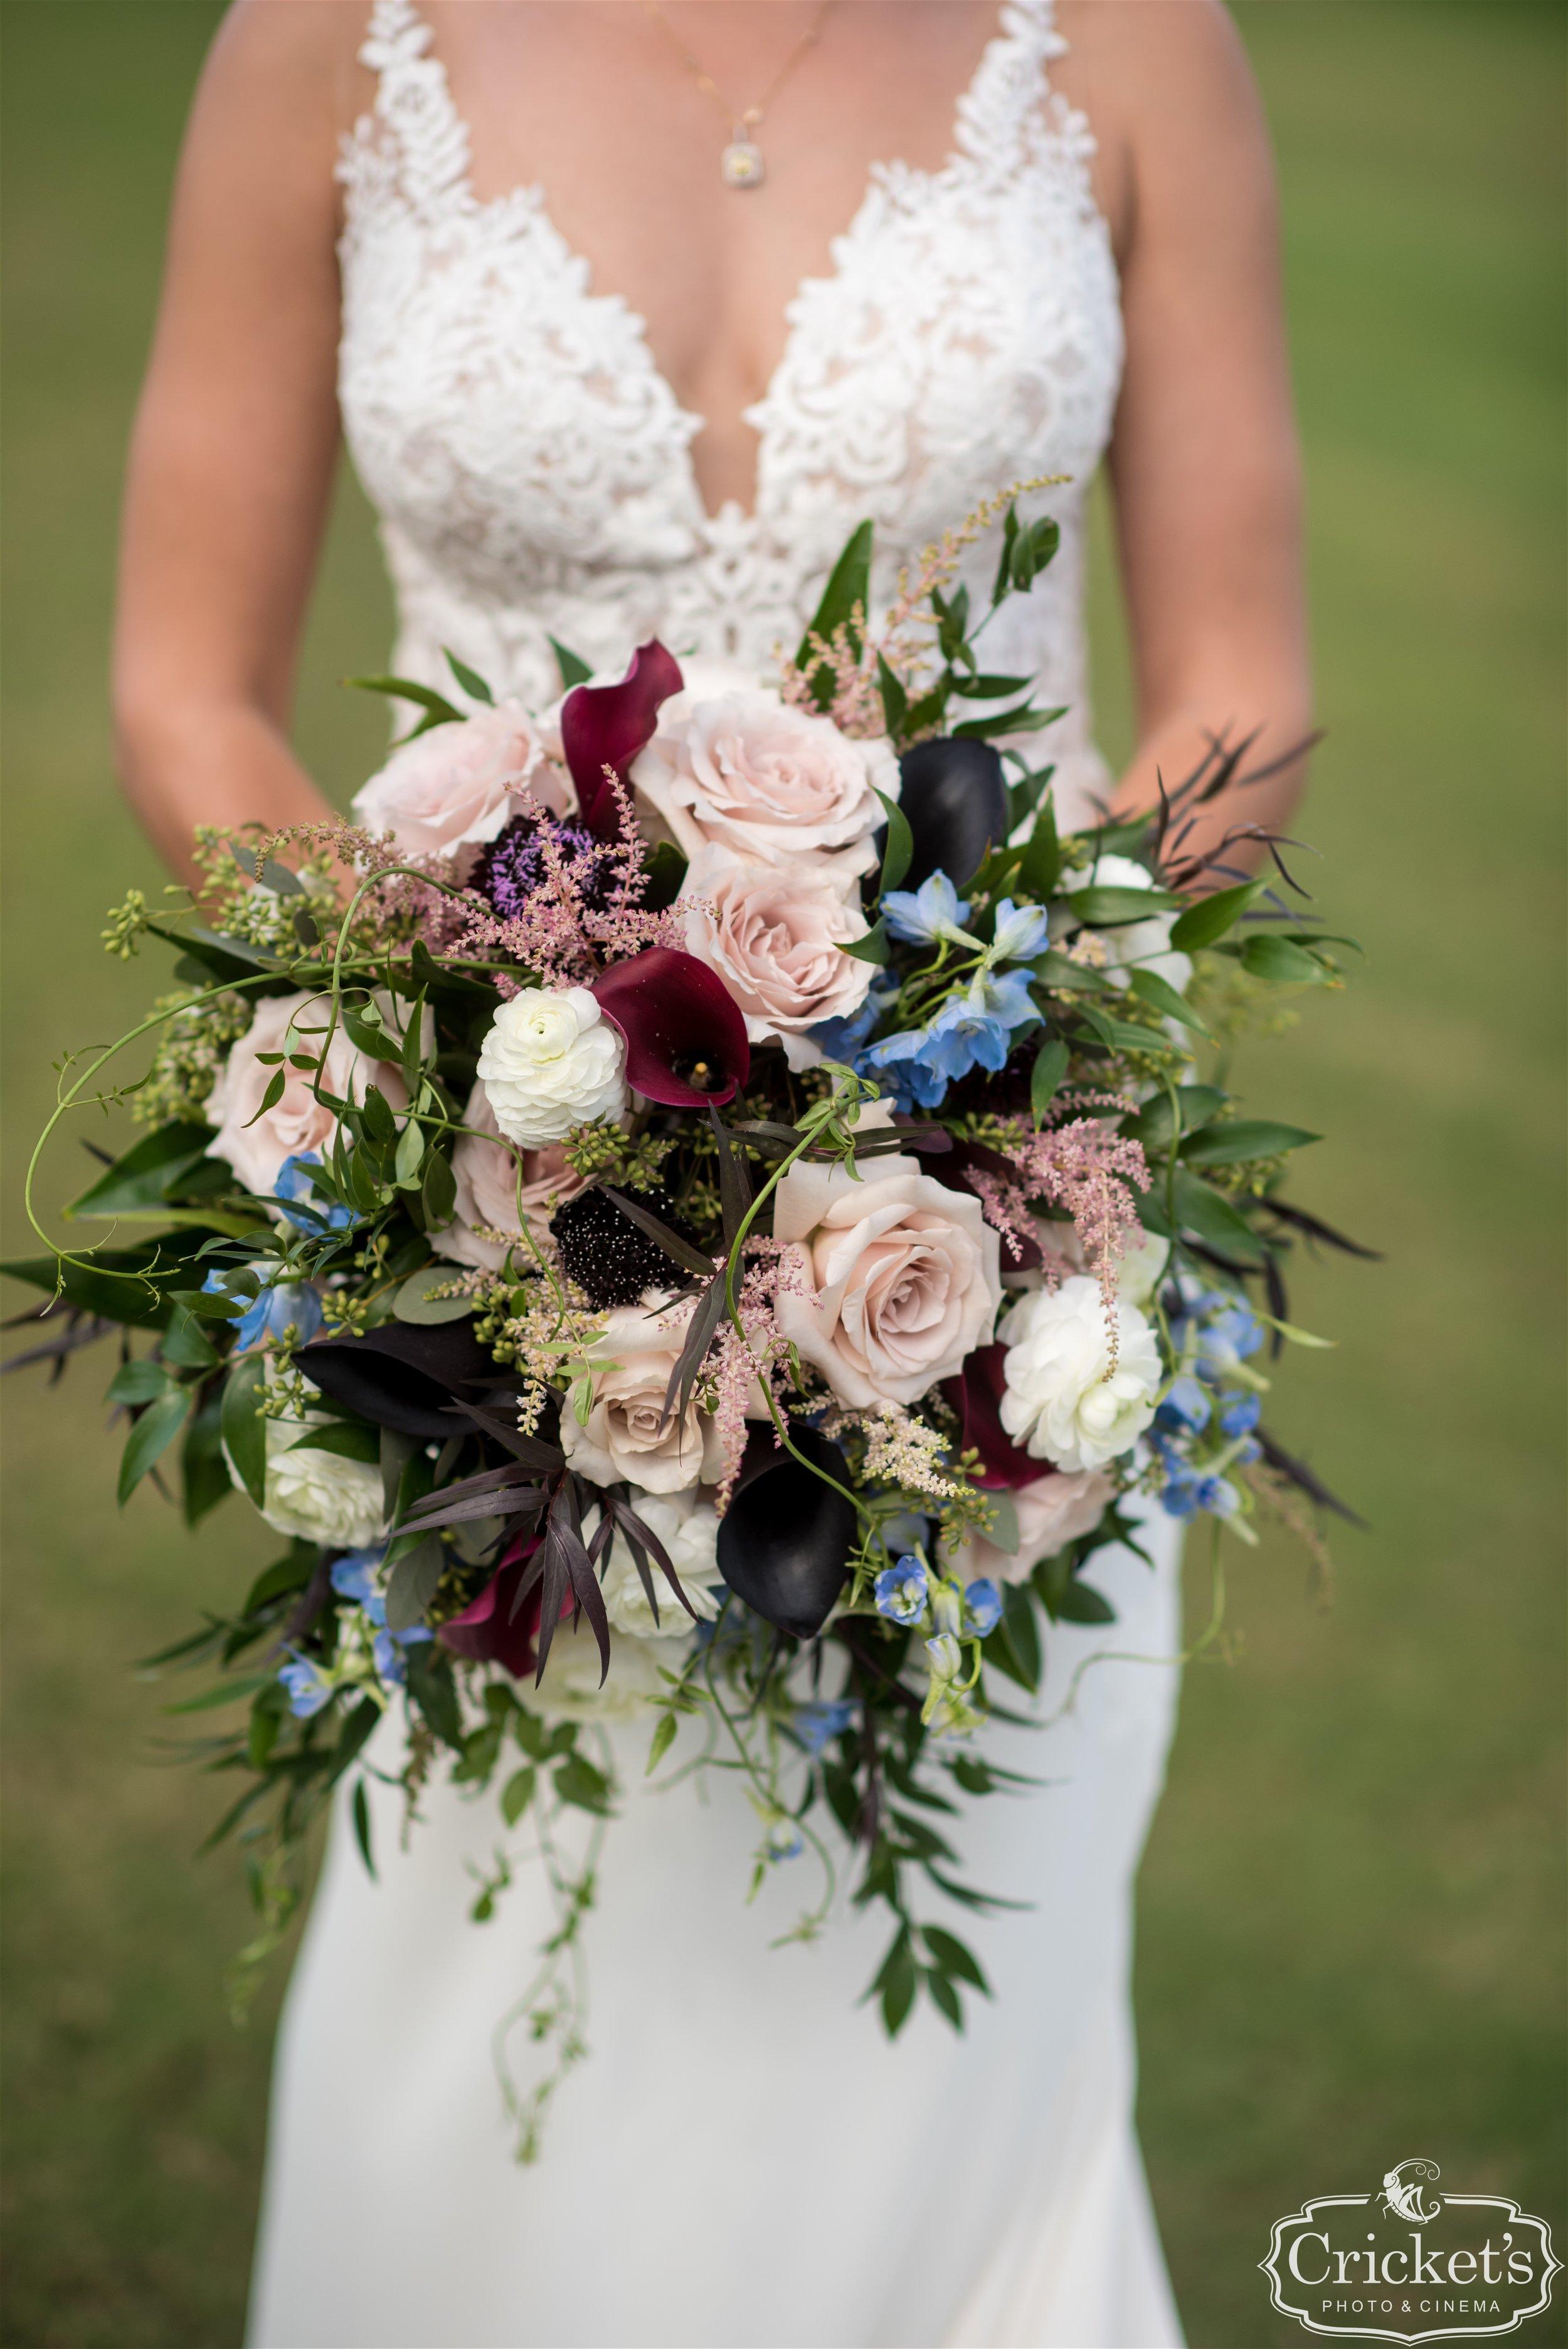 Wedding Photographer:  Cricket's Photo and Cinema  | Wedding Coordinator: | Wedding Location: